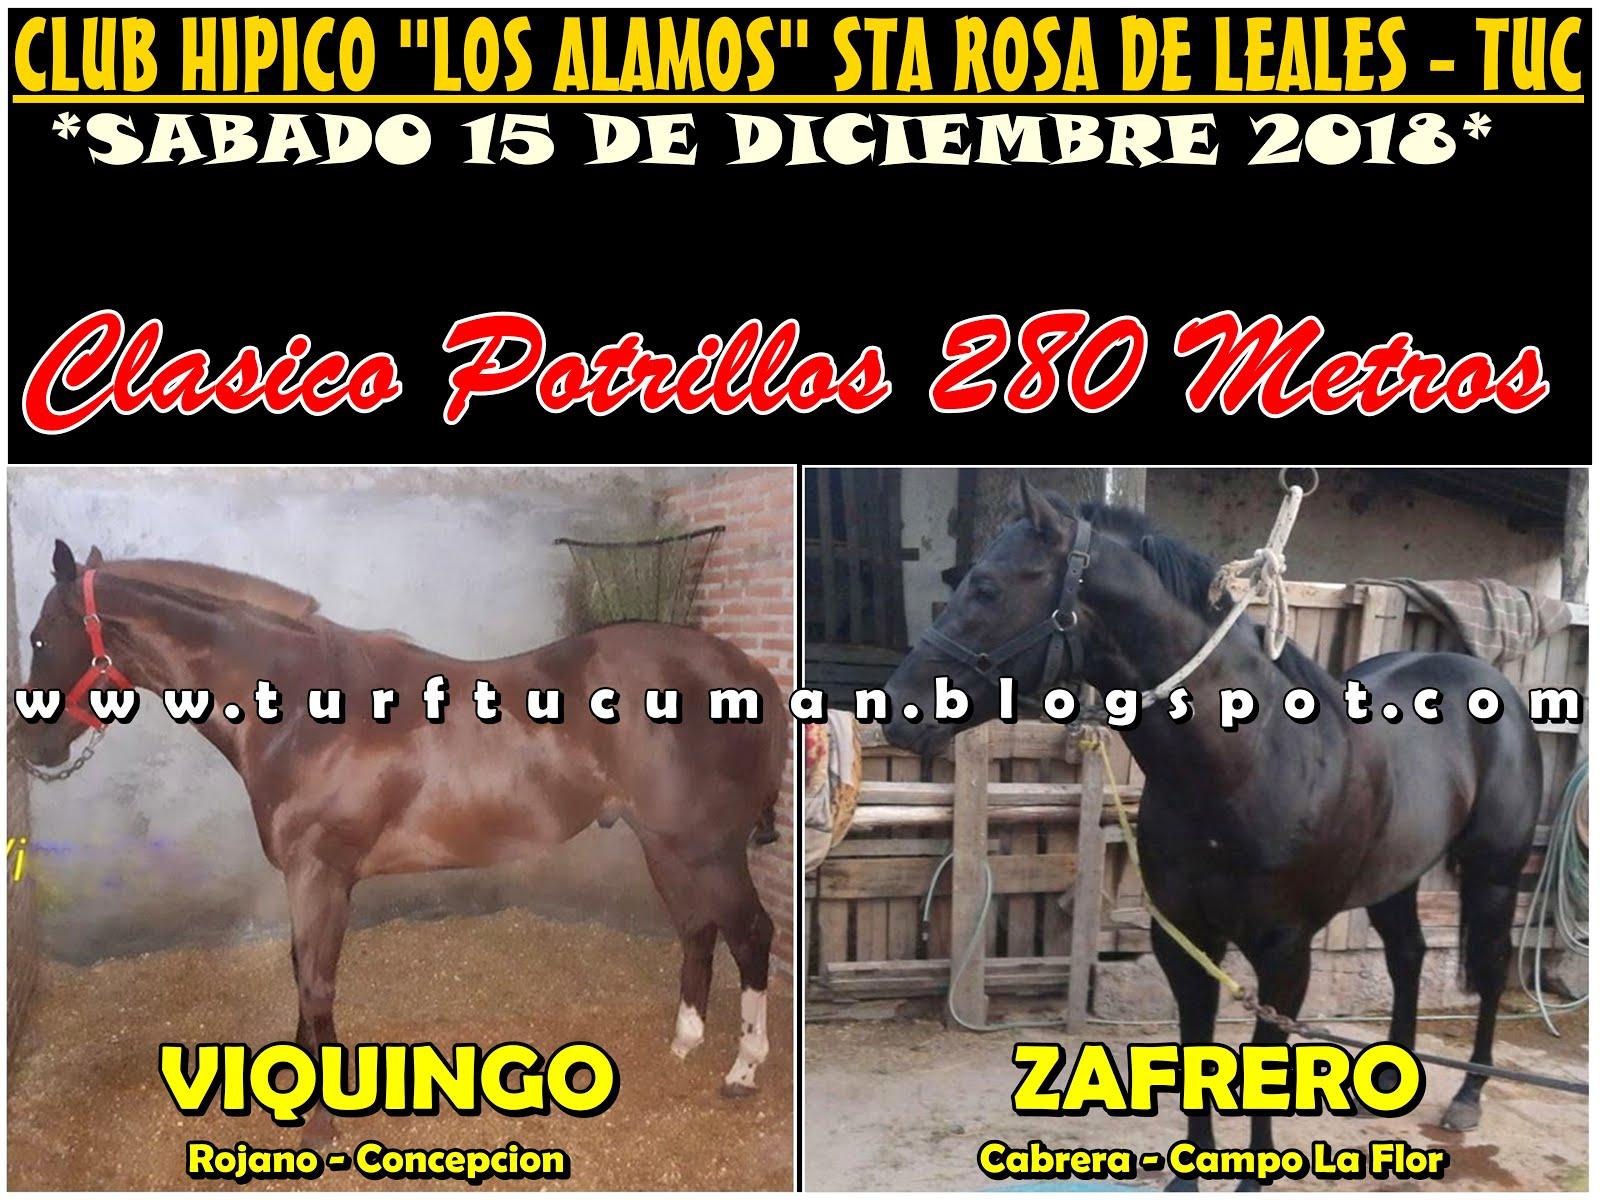 VIQUINGO VS ZAFRERO